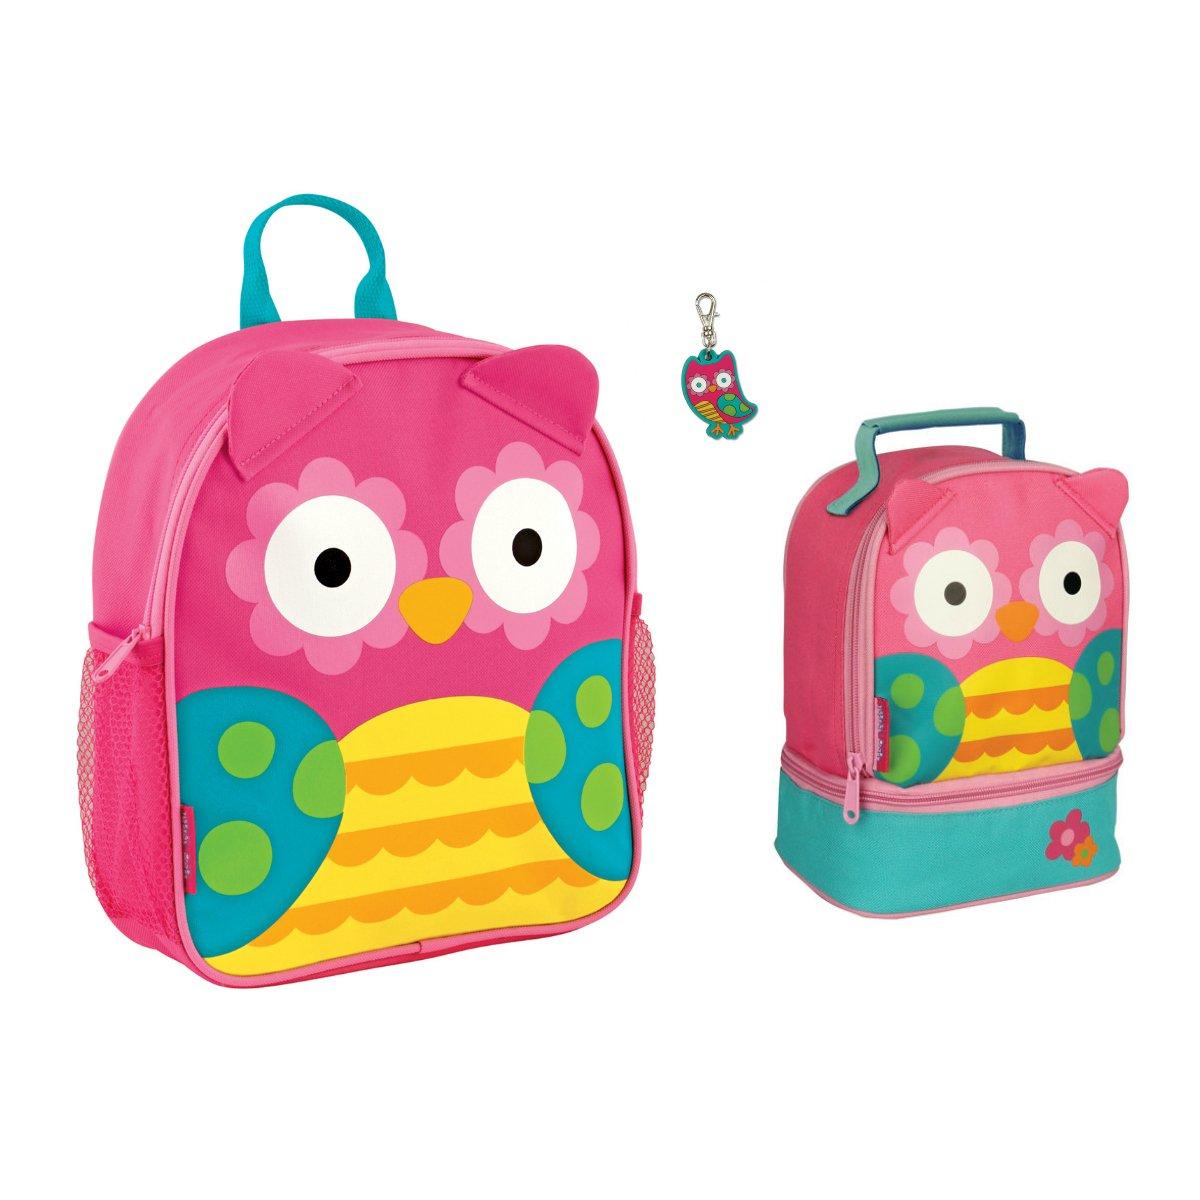 Stephen Joseph Girls Mini Owl Backpack, Lunch Pal and Zipper Pull